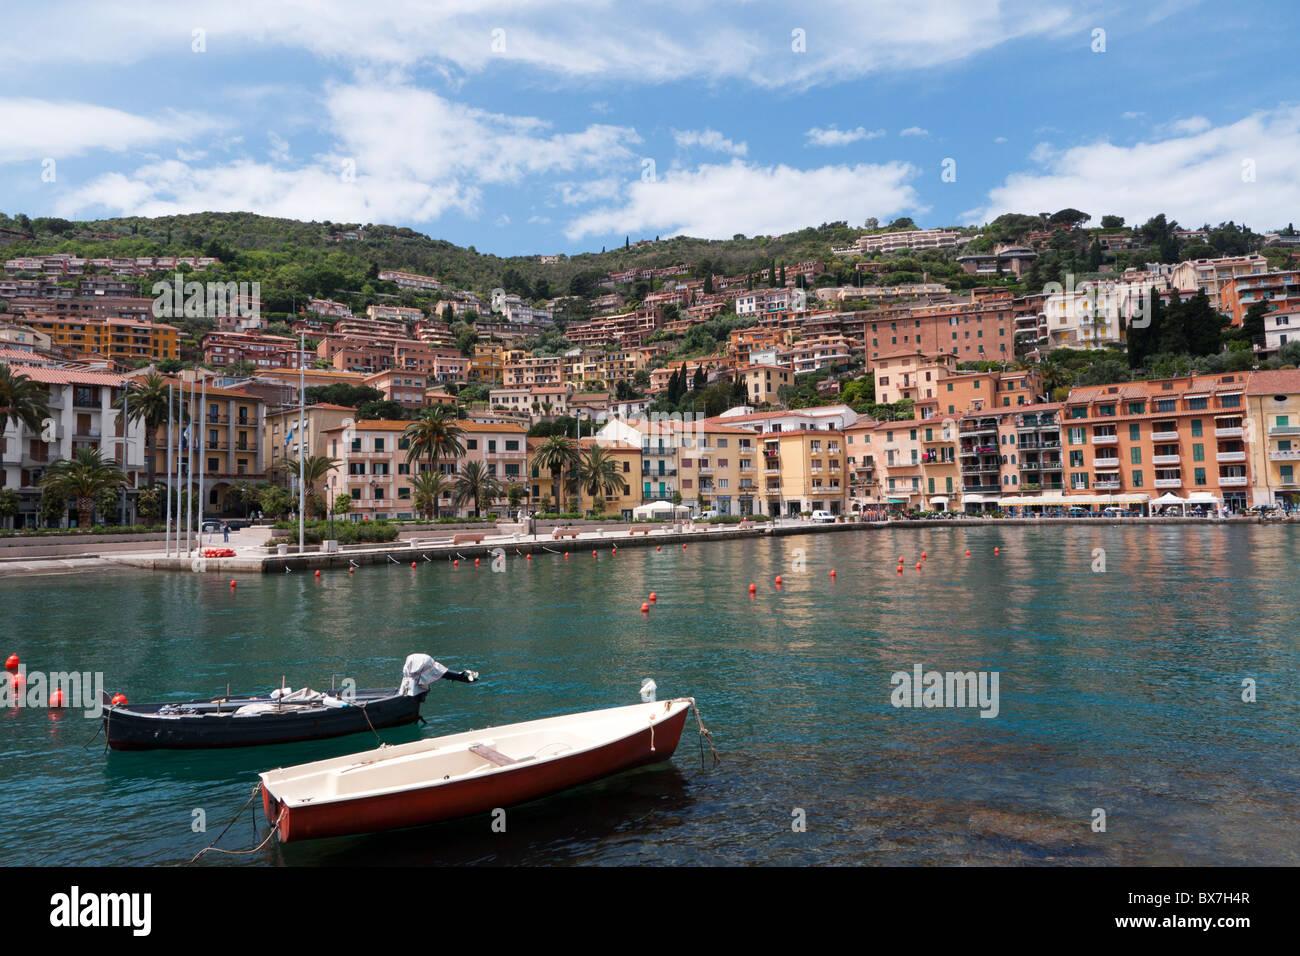 Porto Santo Stefano, Italy - Stock Image